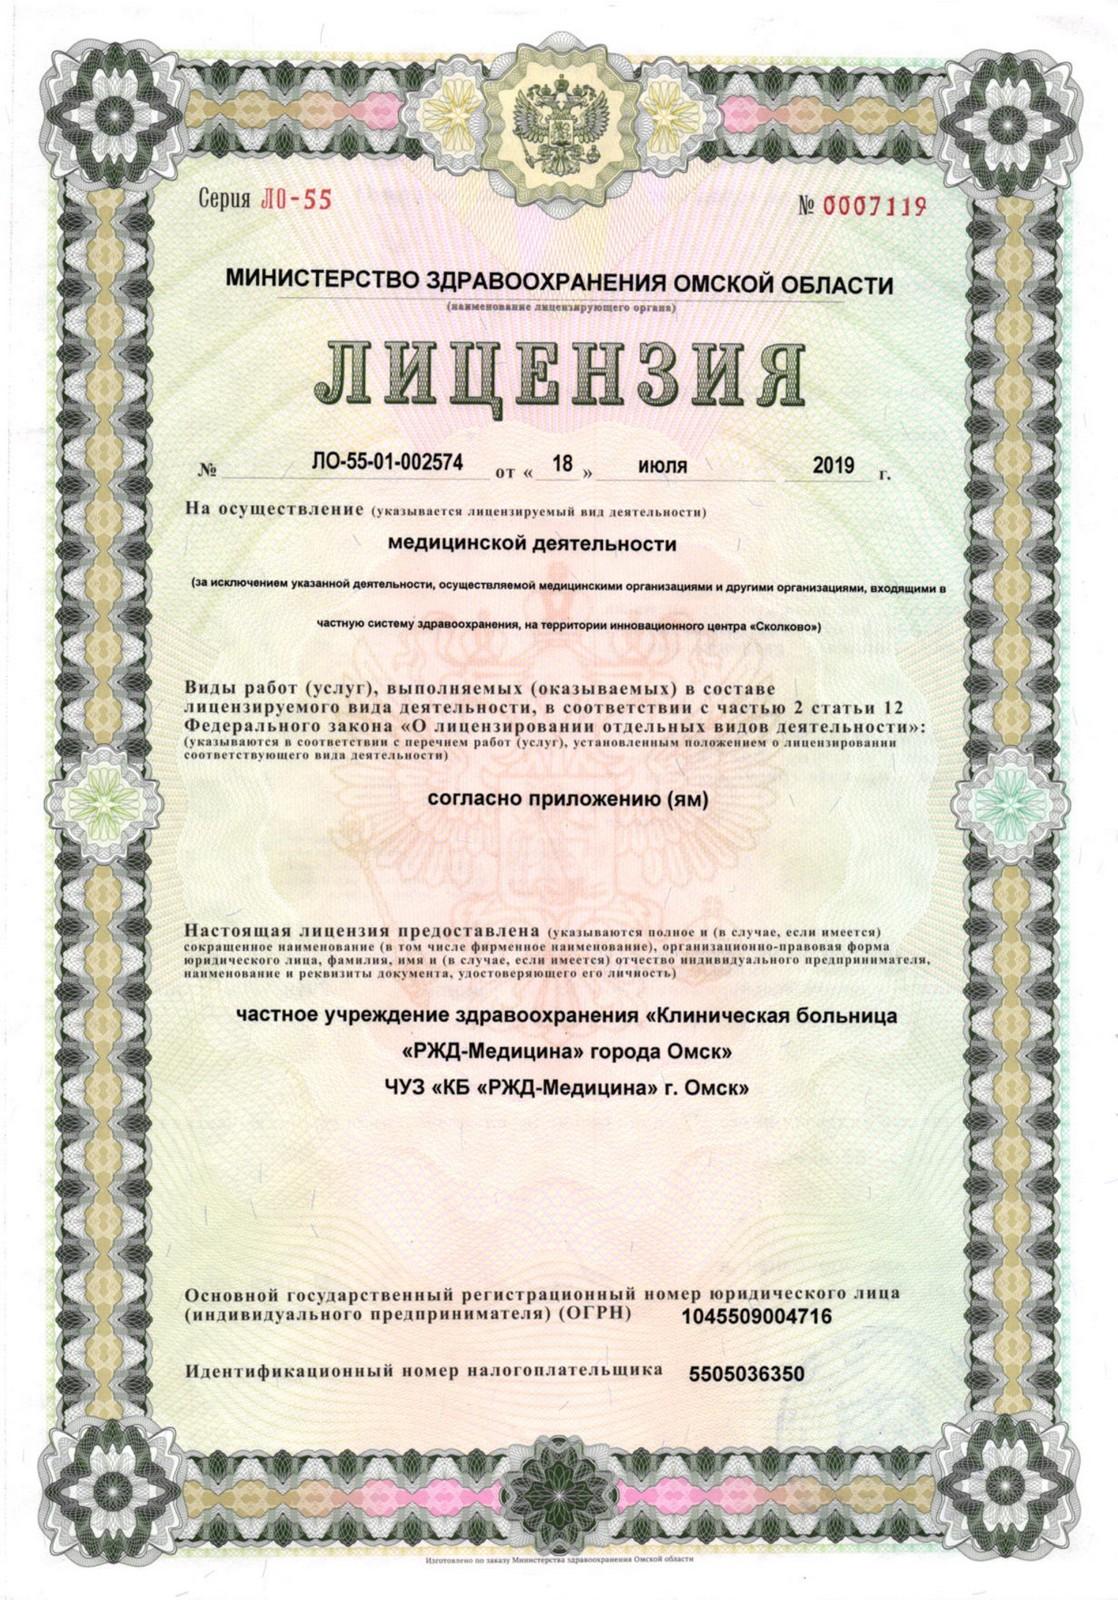 License-2019-07-18_01